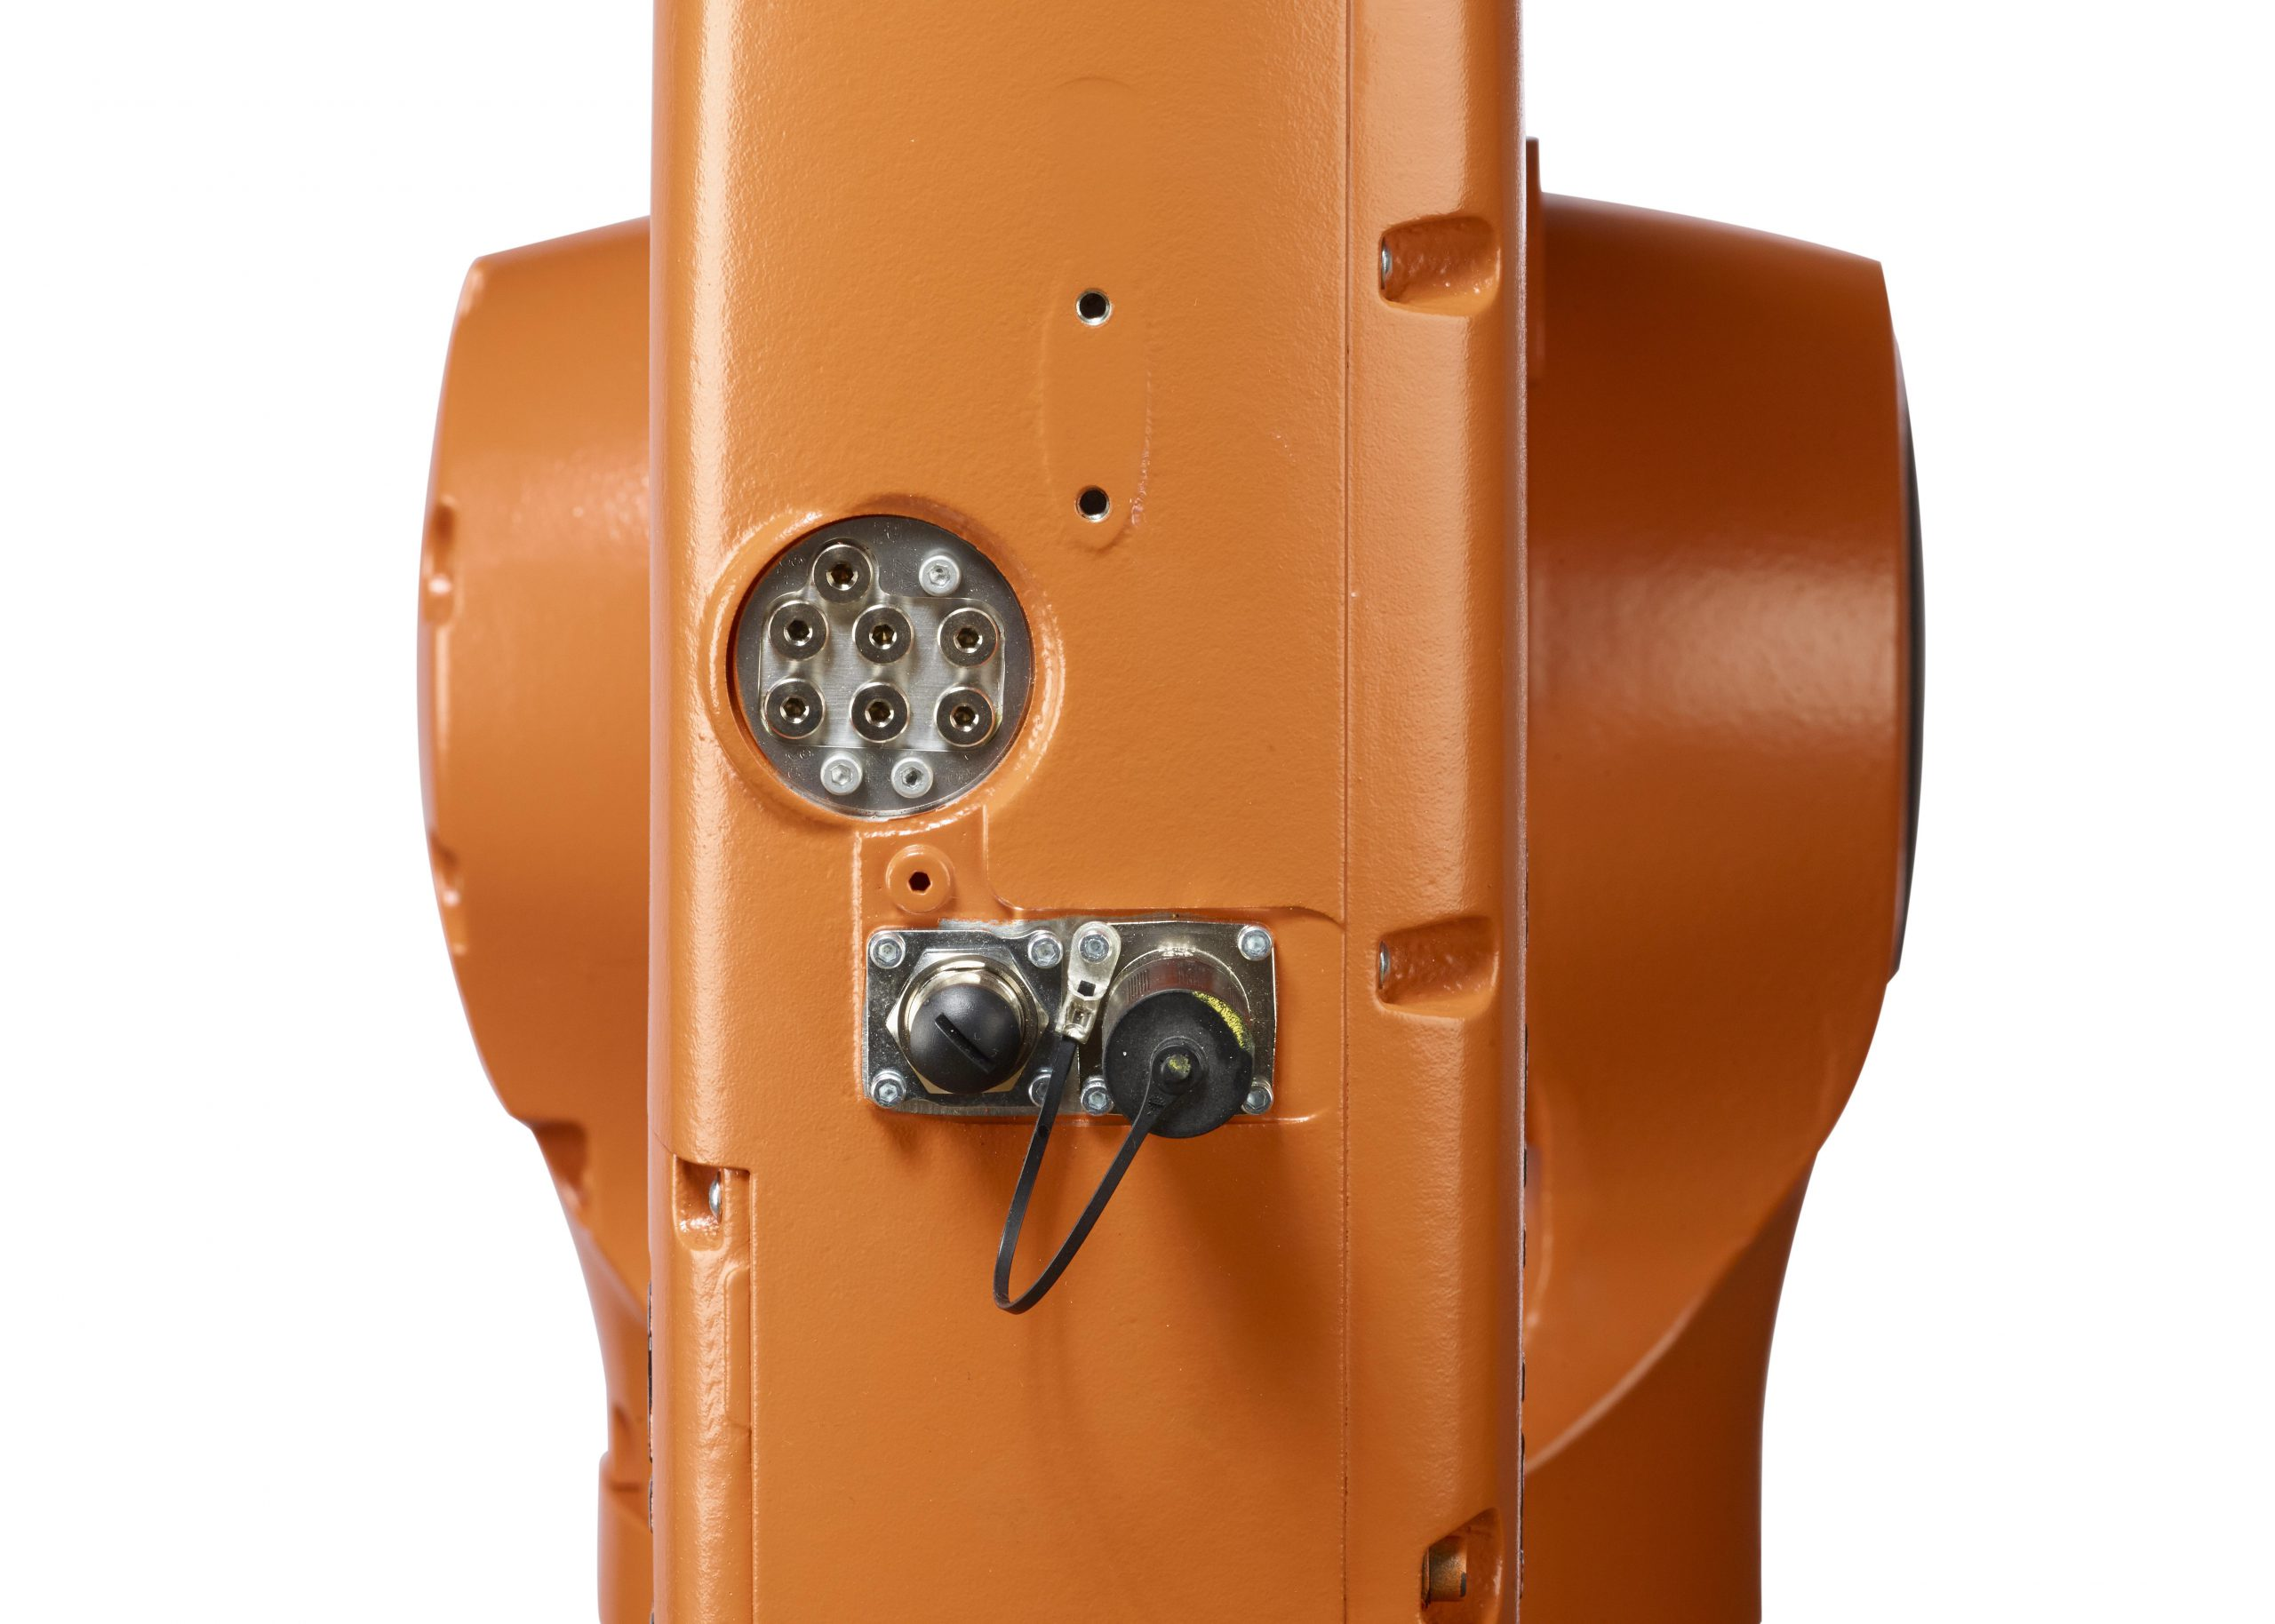 KUKA KR 10 R900 sixx (KR AGILUS)-9